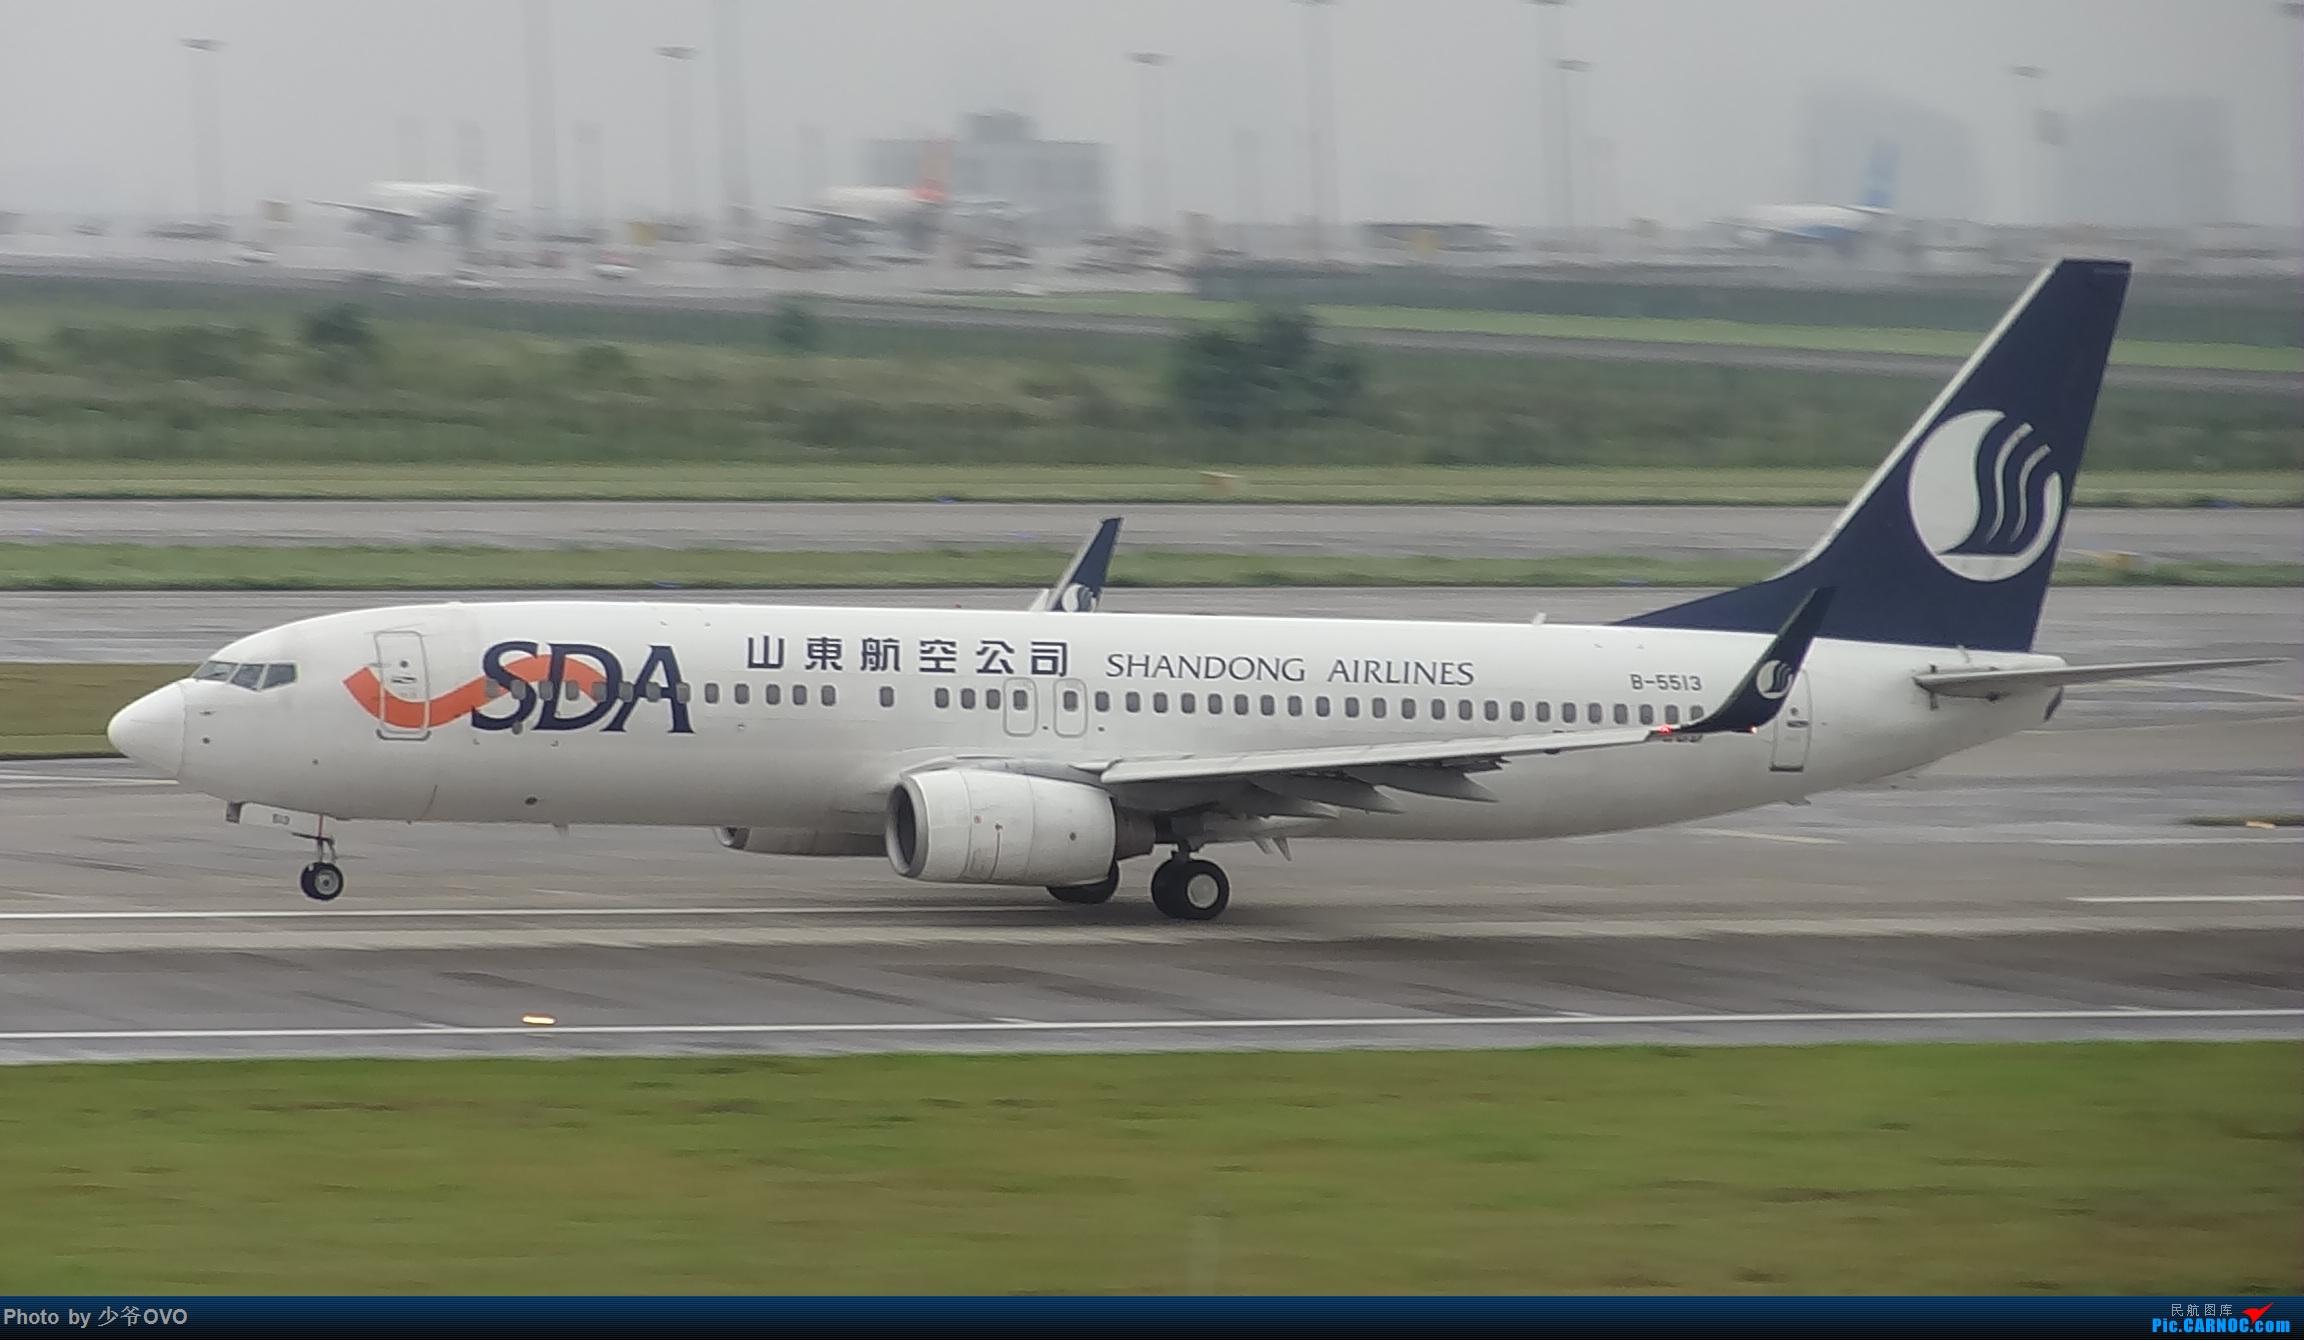 Re:[原创]CKG重庆江北机场拍机 ,中法建交50周年 BOEING 737-800 B-5513 中国重庆江北国际机场